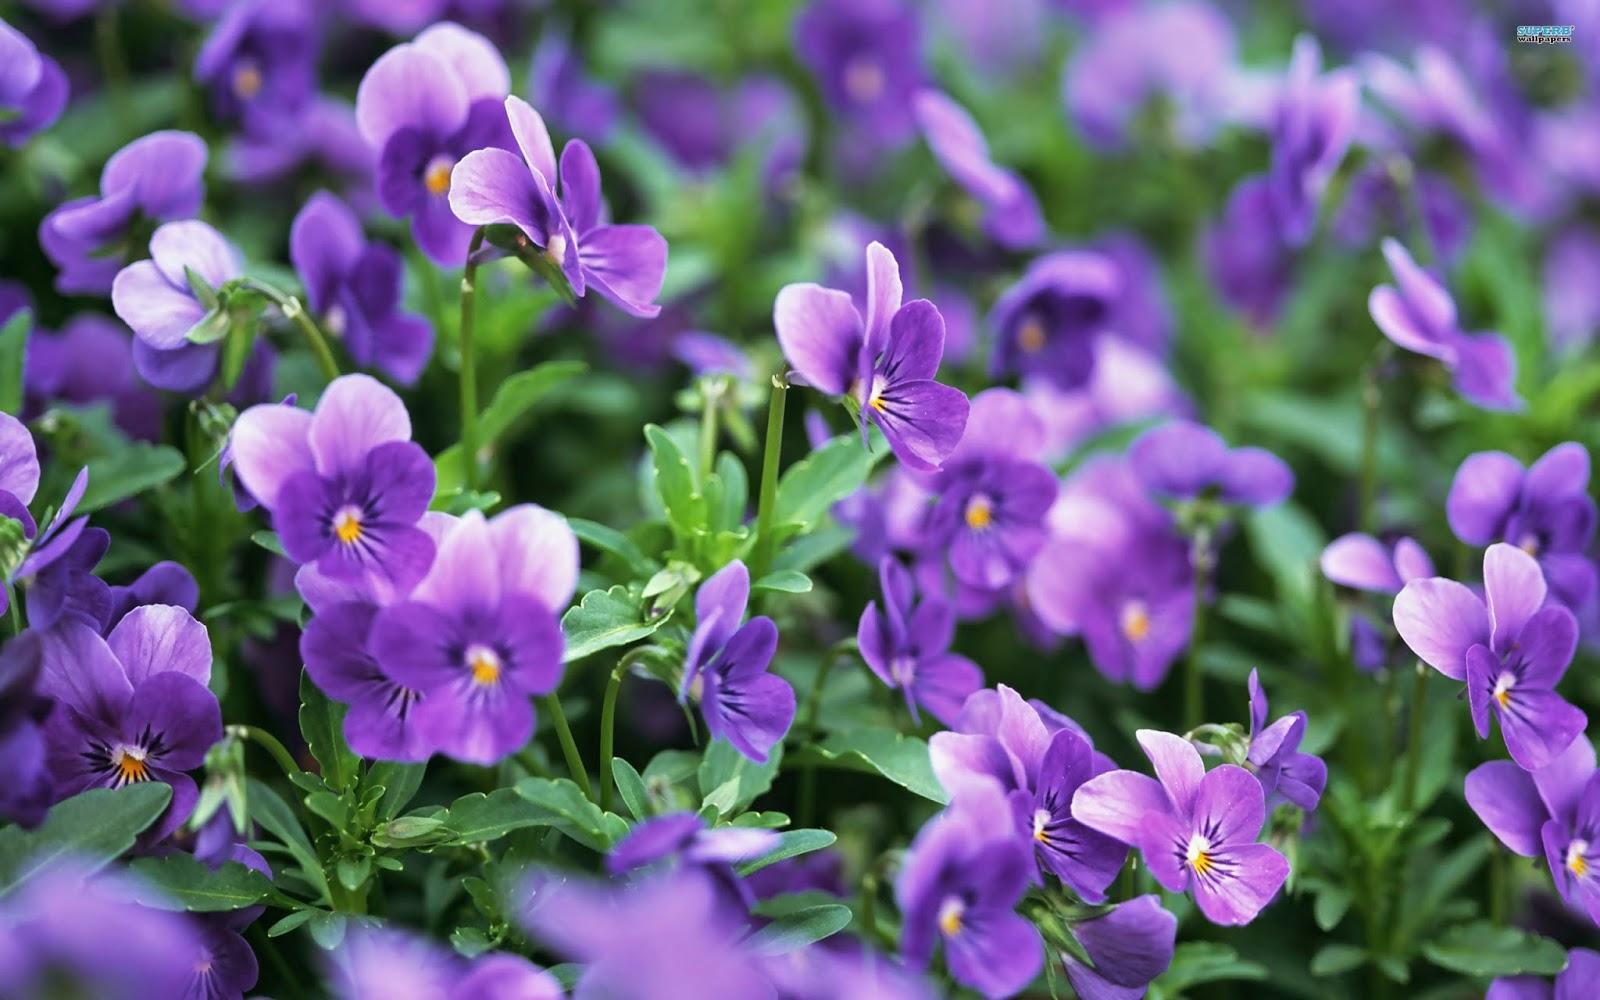 Ý nghĩa hoa violet tím